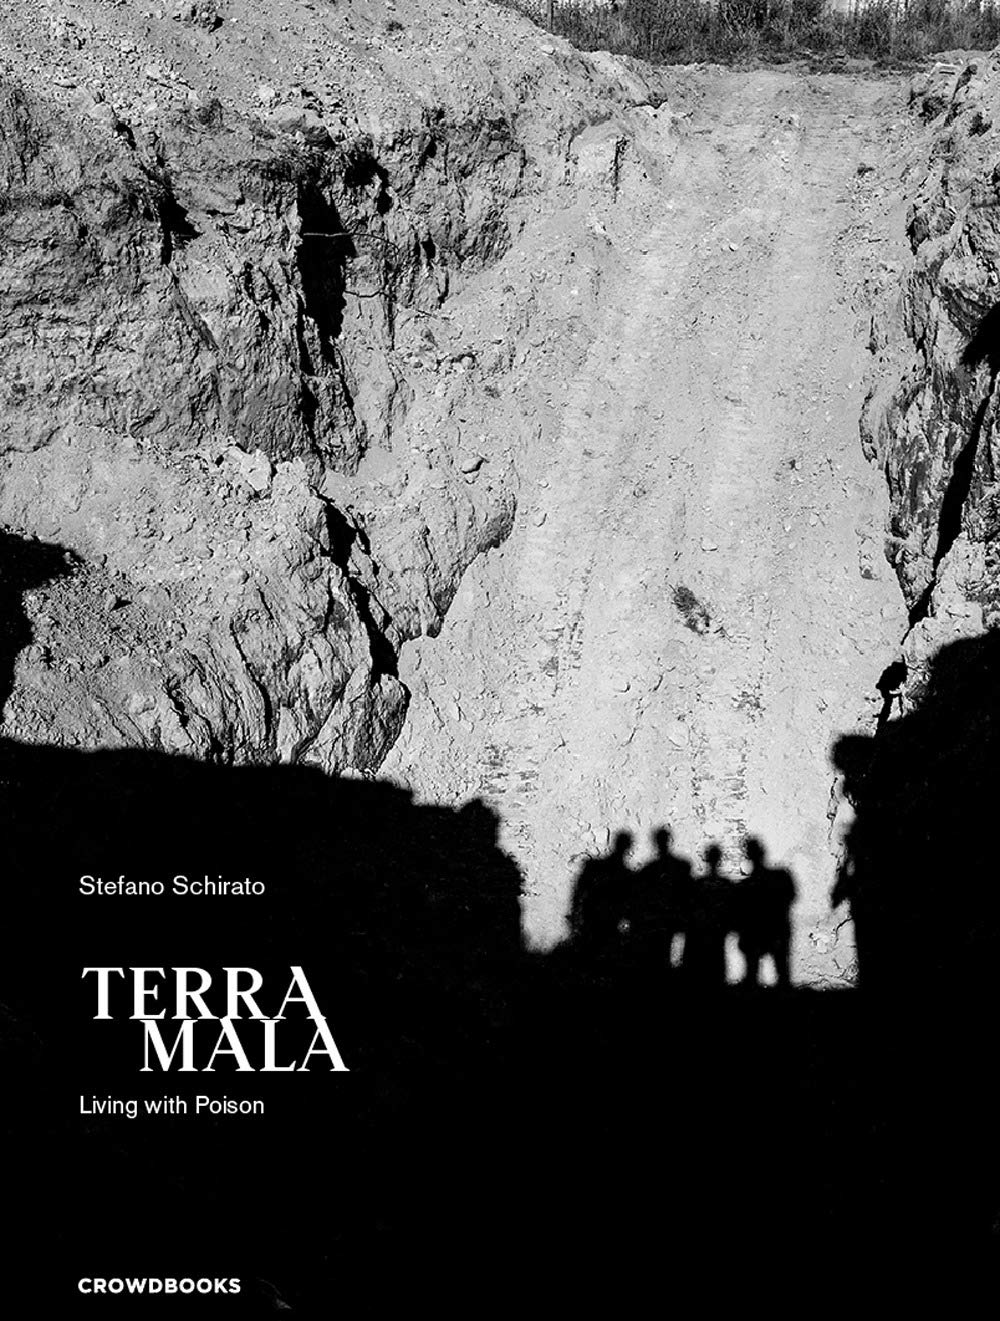 Terra mala. Living with poison. Ediz. italiana e inglese (Inglese) Copertina rigida – 1 ott 2018 Stefano Schirato Crowdbooks 8885608140 Campania